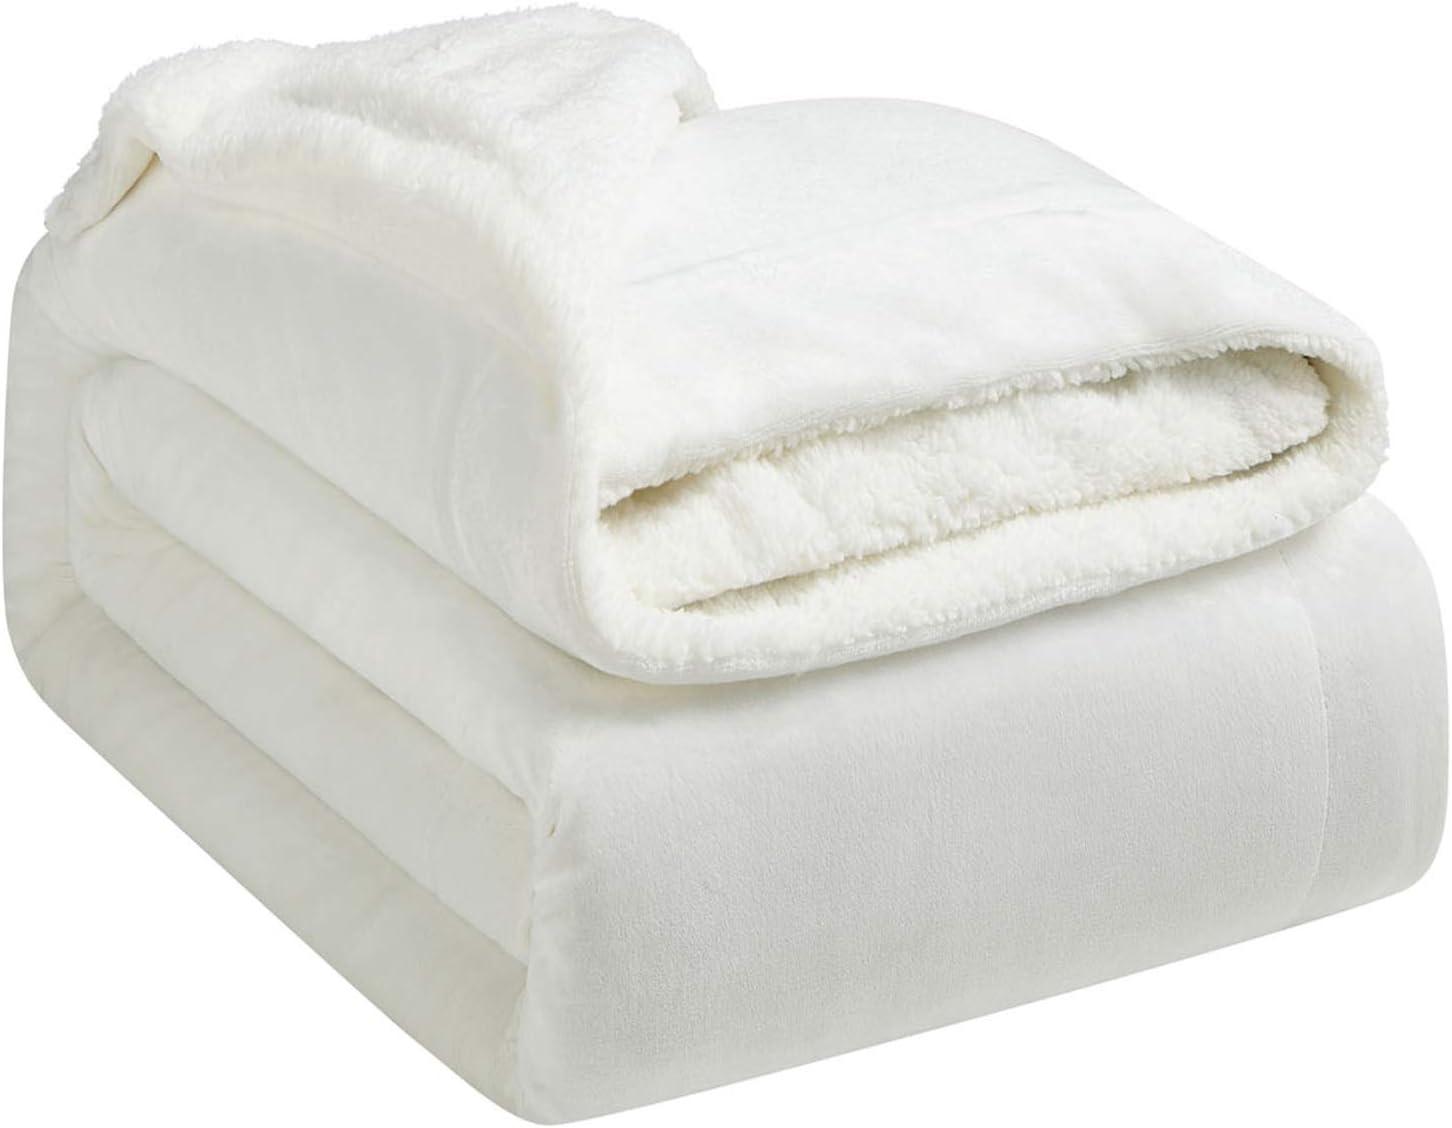 Hansleep Manta Reversible de Franela Sherpa, 220x240 cm Manta Polar para Sofá Cama, 100% Microfibra Cepillada Extra Suave Transpirable - Mantas de Pelo Cálida Acogedor, Blanco